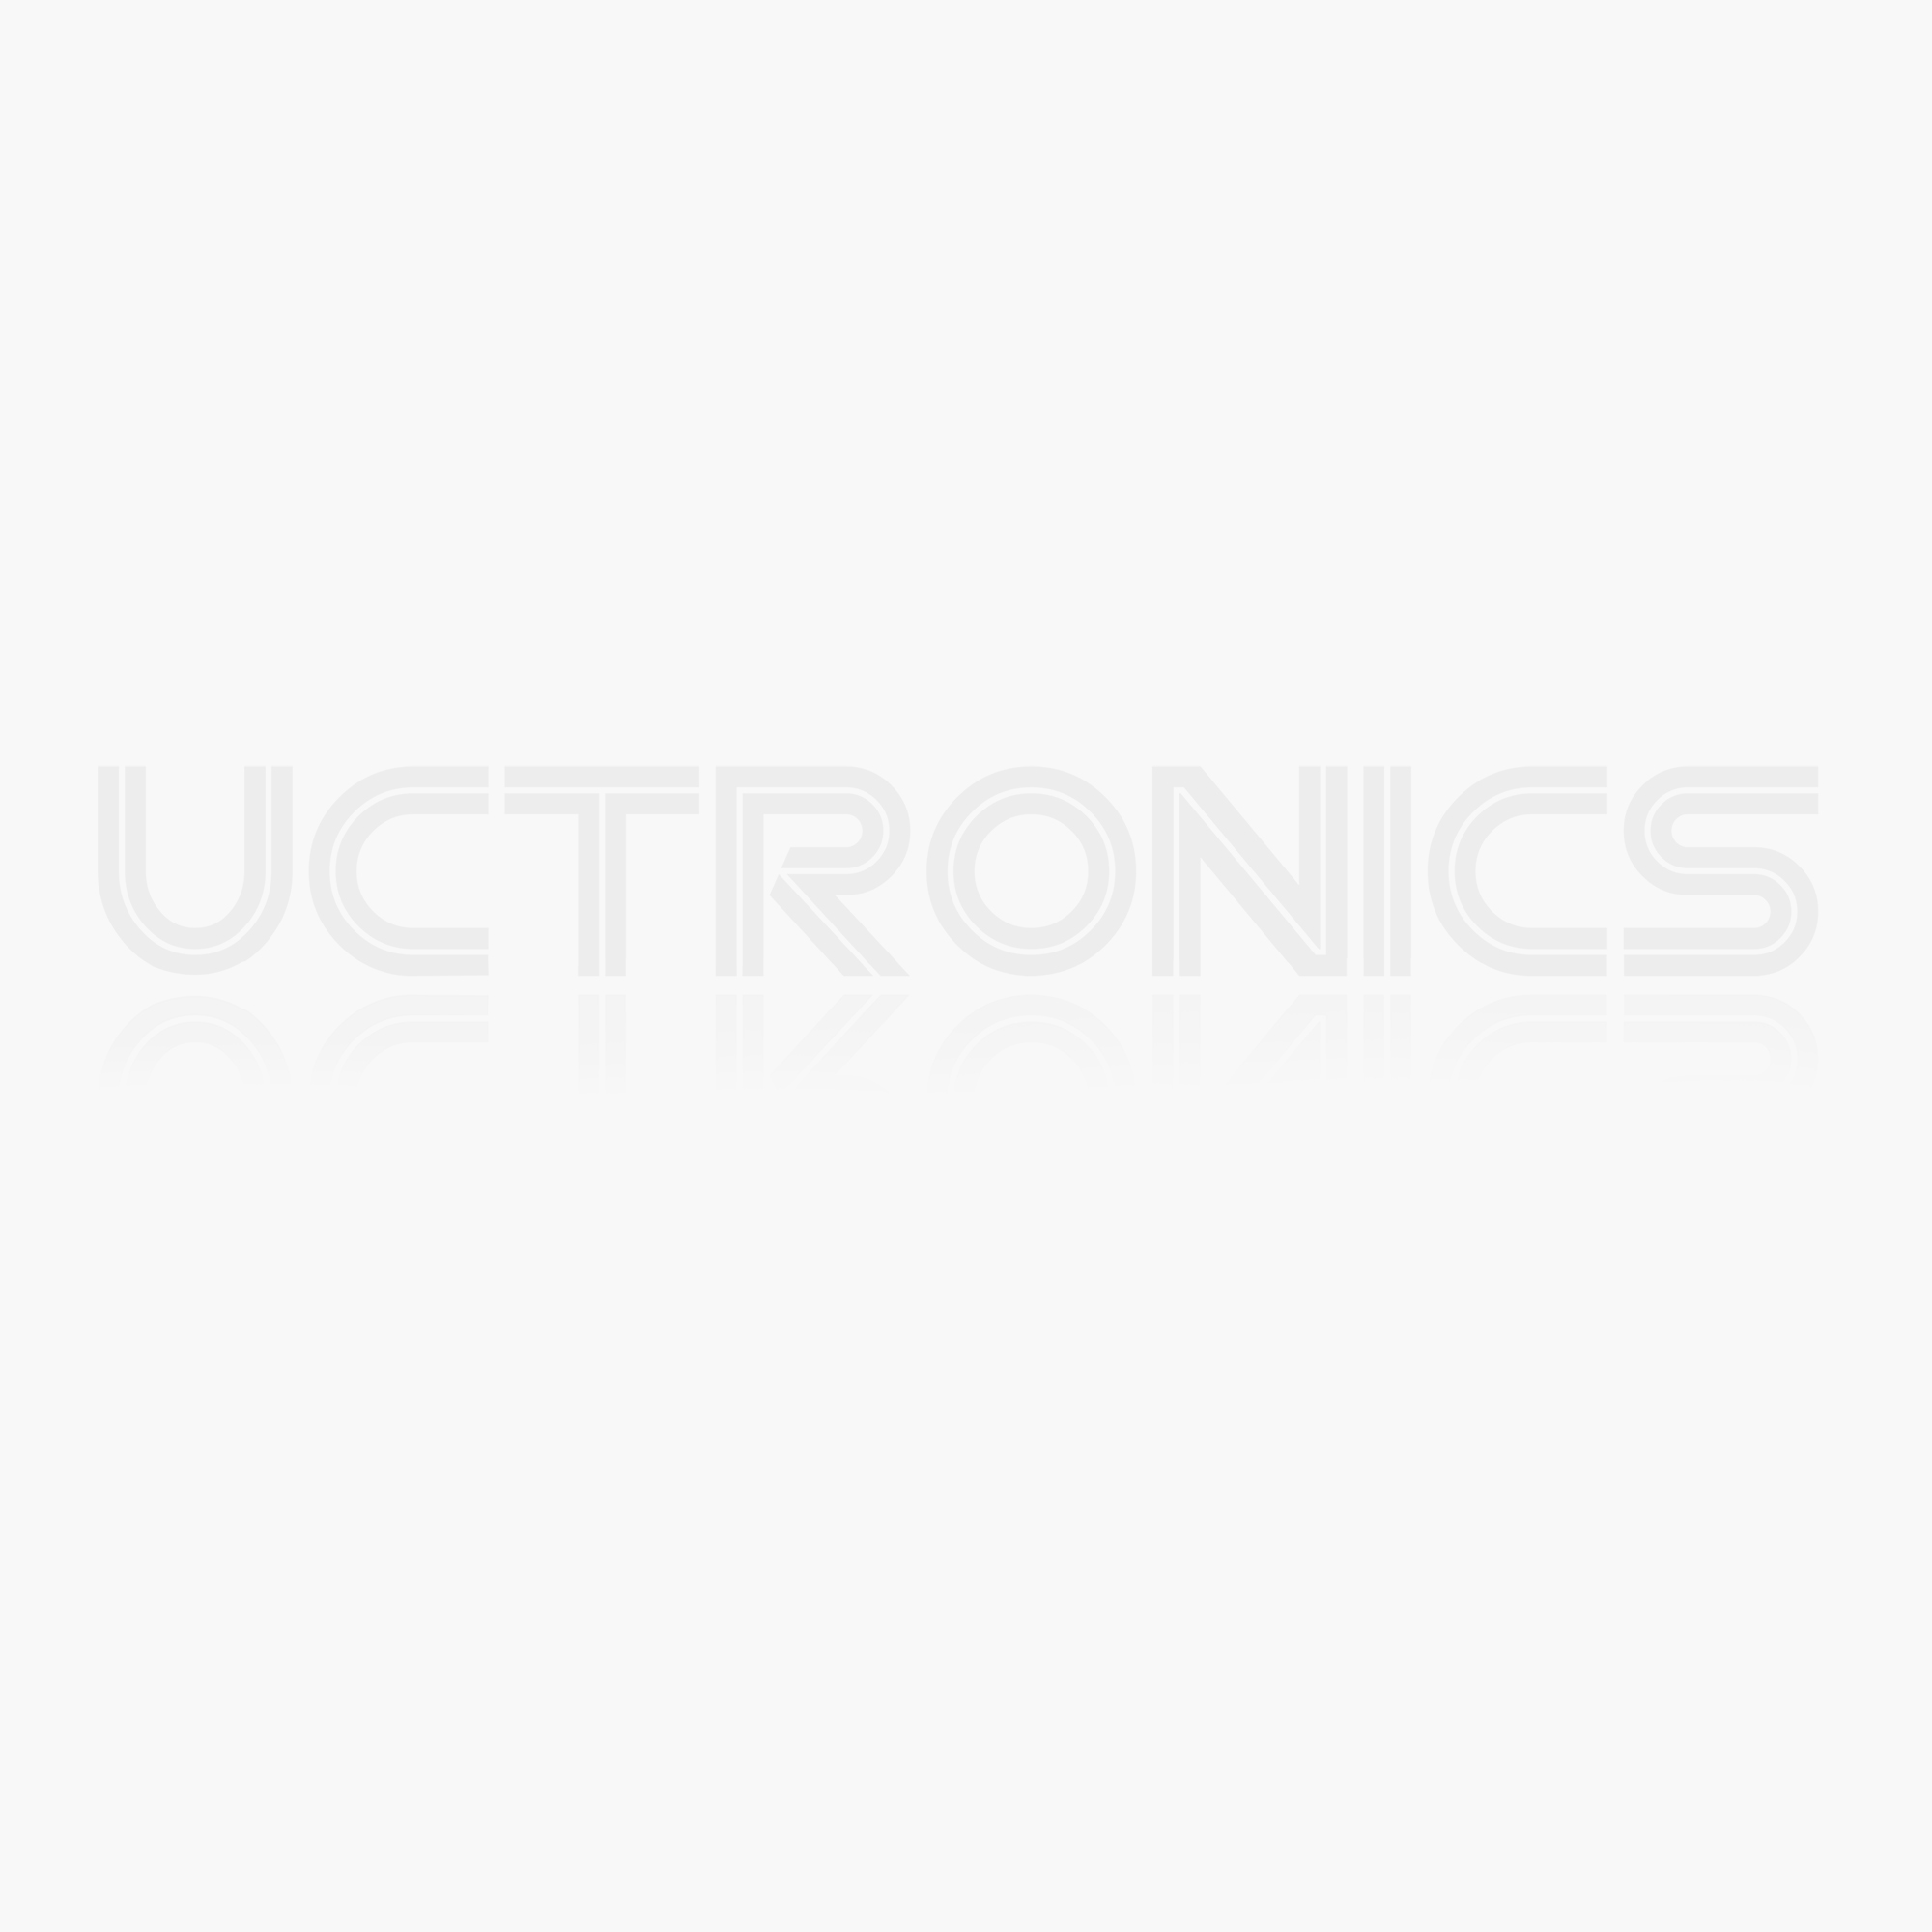 AVRISP USBASP STK500 10PIN to 6PIN Standard Adapter Block